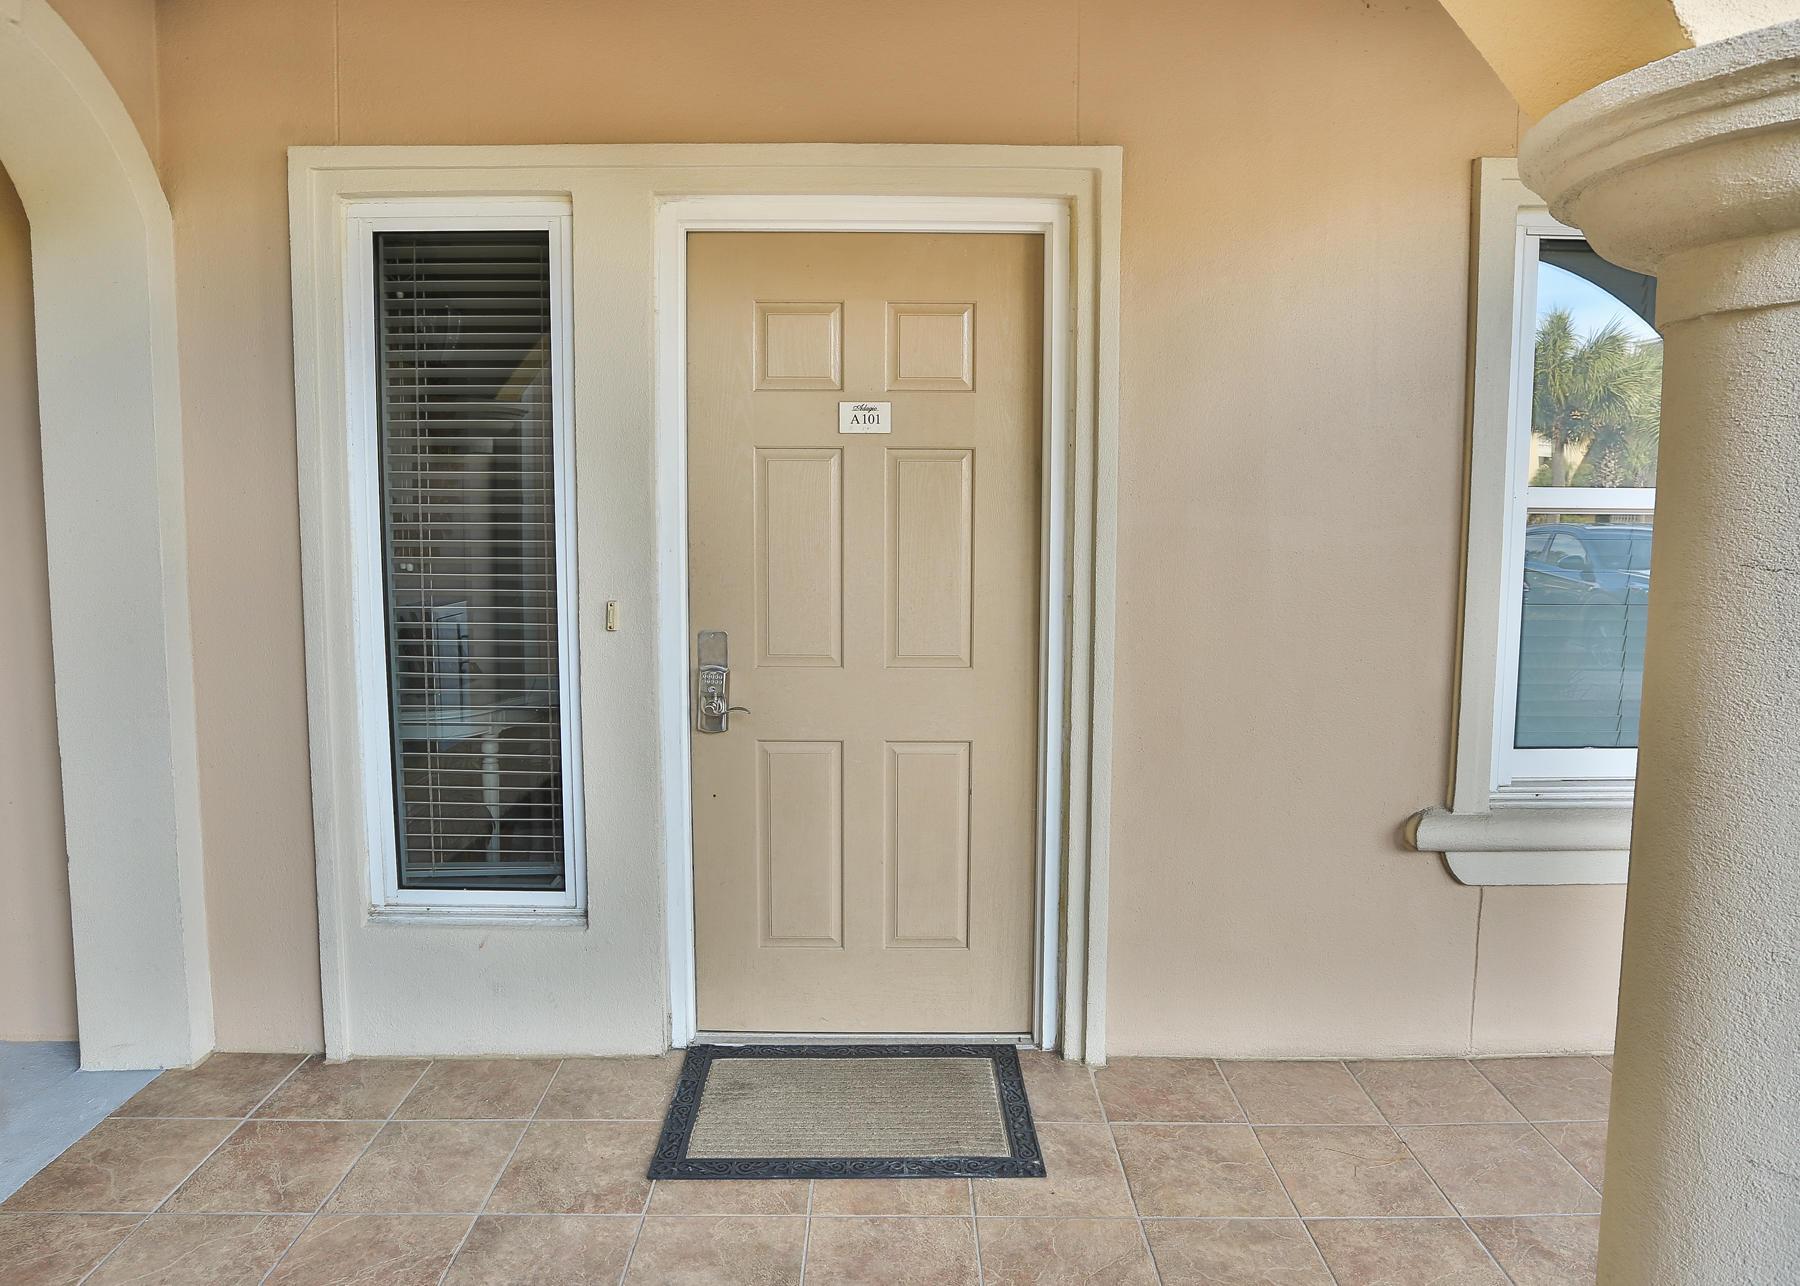 2421 Co Highway 30-A,Santa Rosa Beach,Florida 32459,4 Bedrooms Bedrooms,3 BathroomsBathrooms,Condominium,Co Highway 30-A,20131126143817002353000000